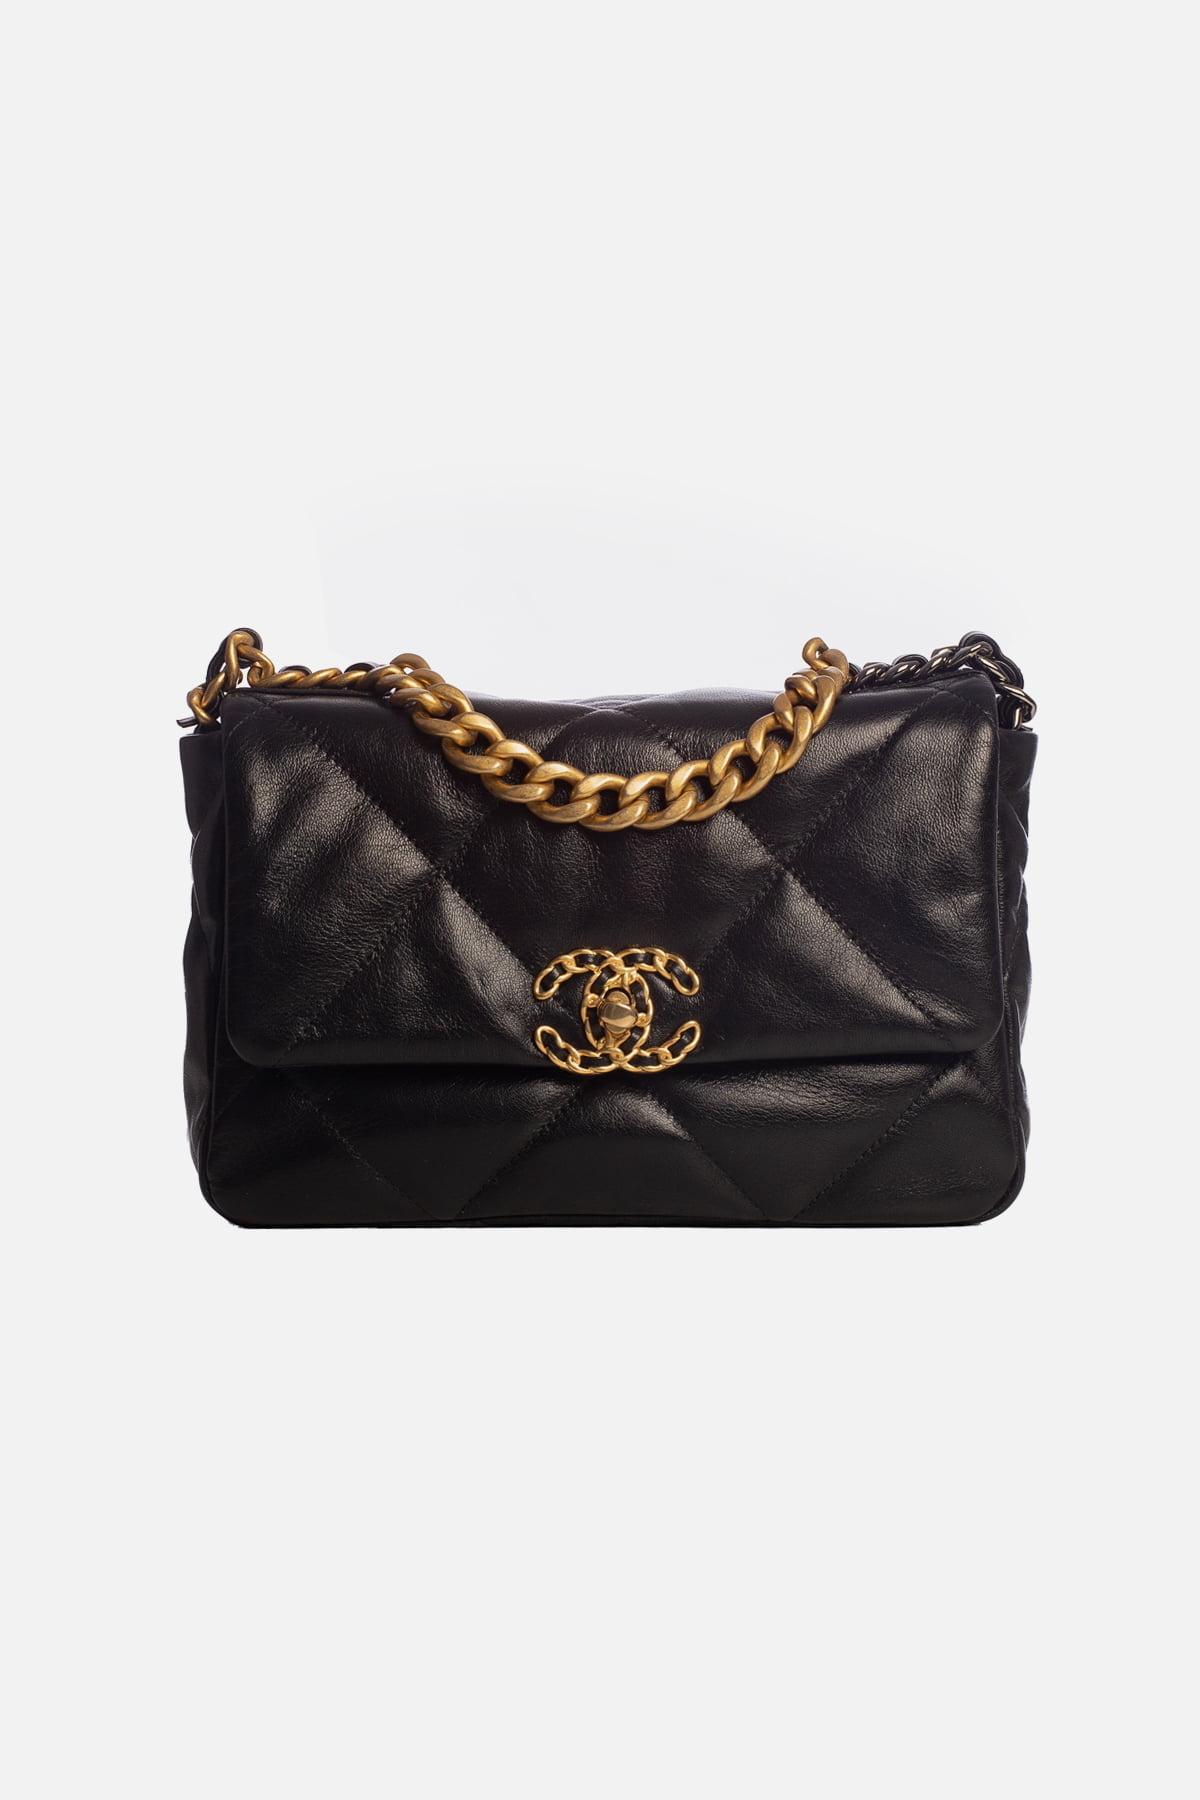 2021 Small 19 Flap Bag